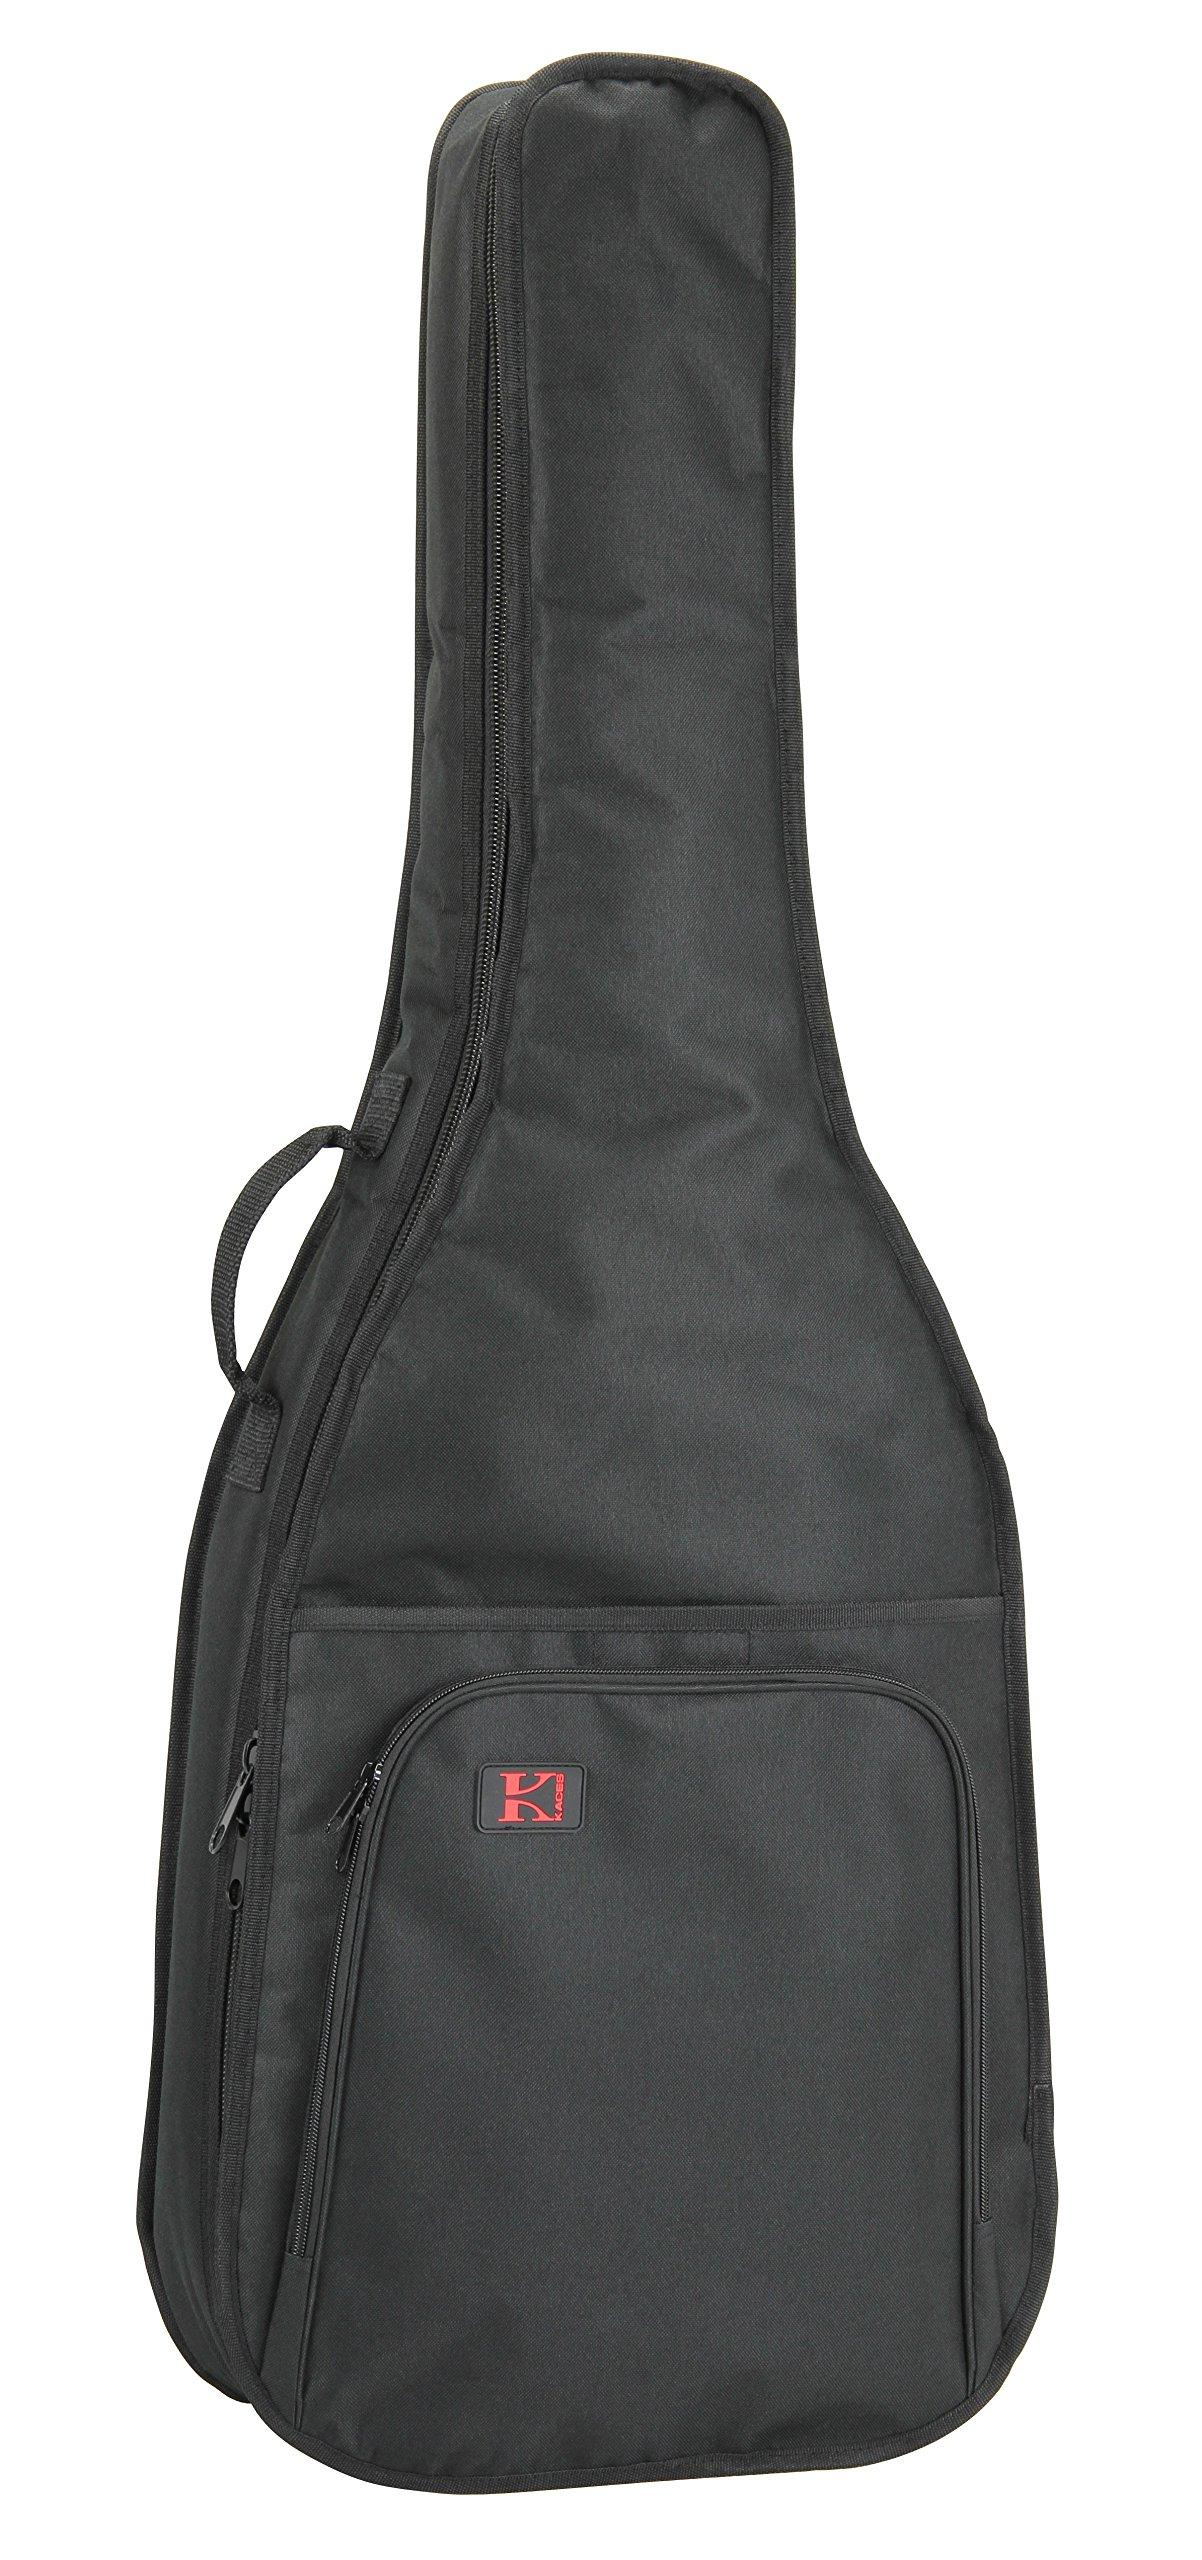 Kaces KQE-335 GigPak Semi-Hollow Electric Guitar Bag